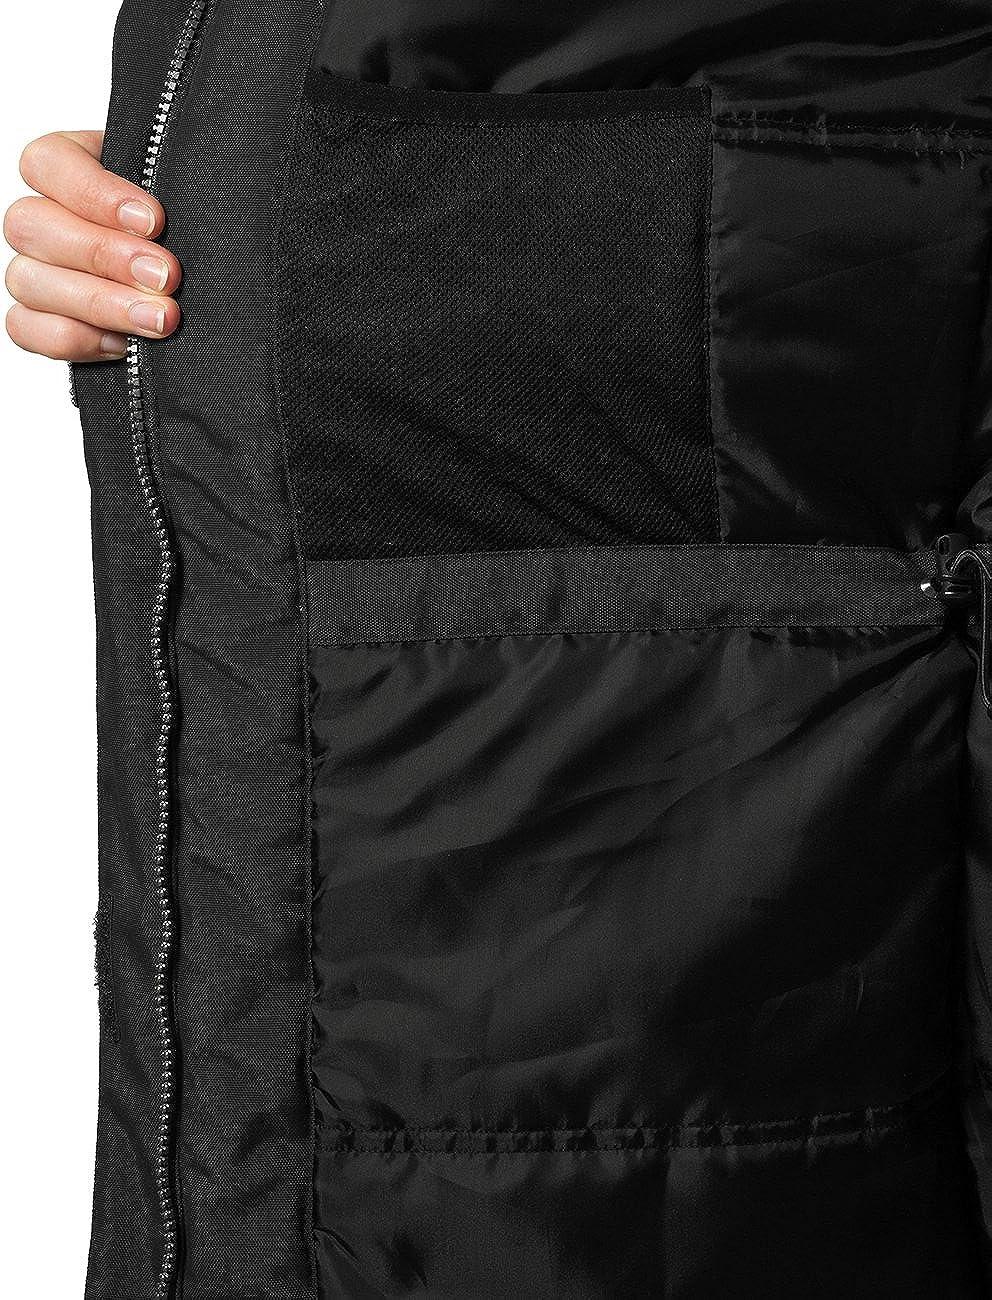 Ultrasport Advanced Damen Outdoor Parka Luca abnehmbare verstellbare Kapuze mit Kunstfell innenliegende Kordel zur Weitenregulierung Winterjacke wasserdicht und nahtverschwei/ßt Ultraflow 3.000